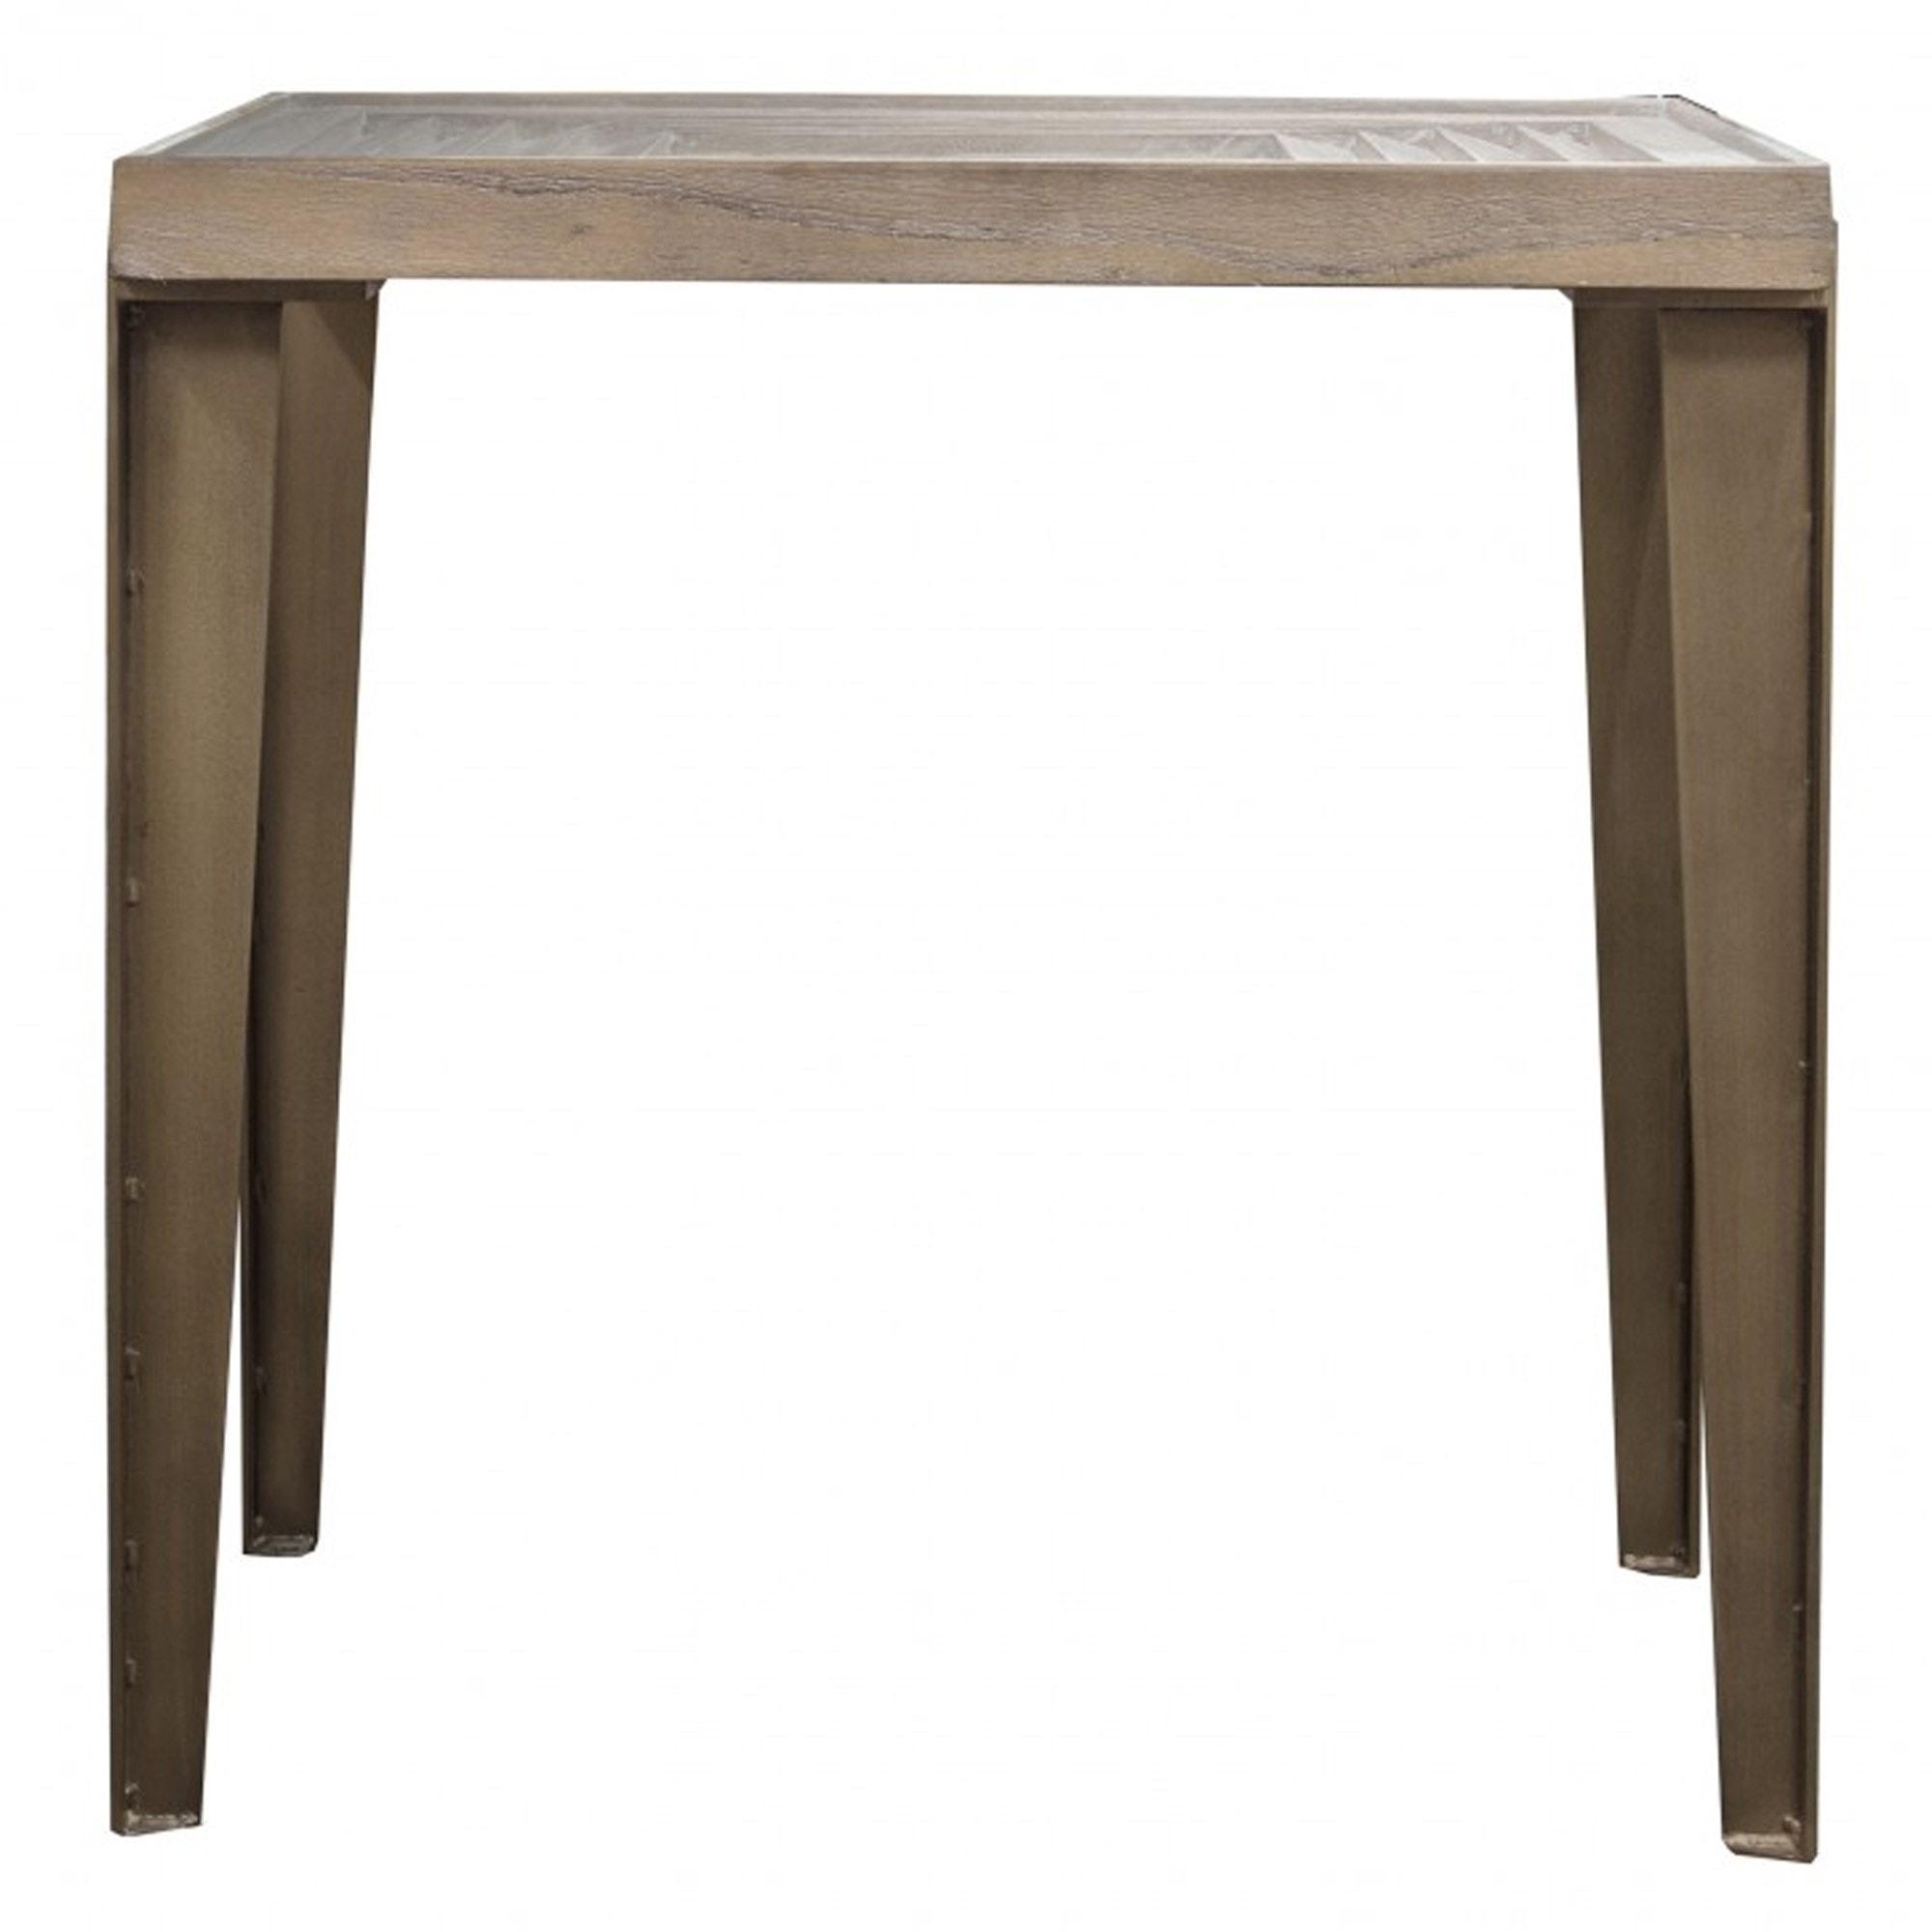 Hackney Side Table Wooden Side Table Modern Side Table